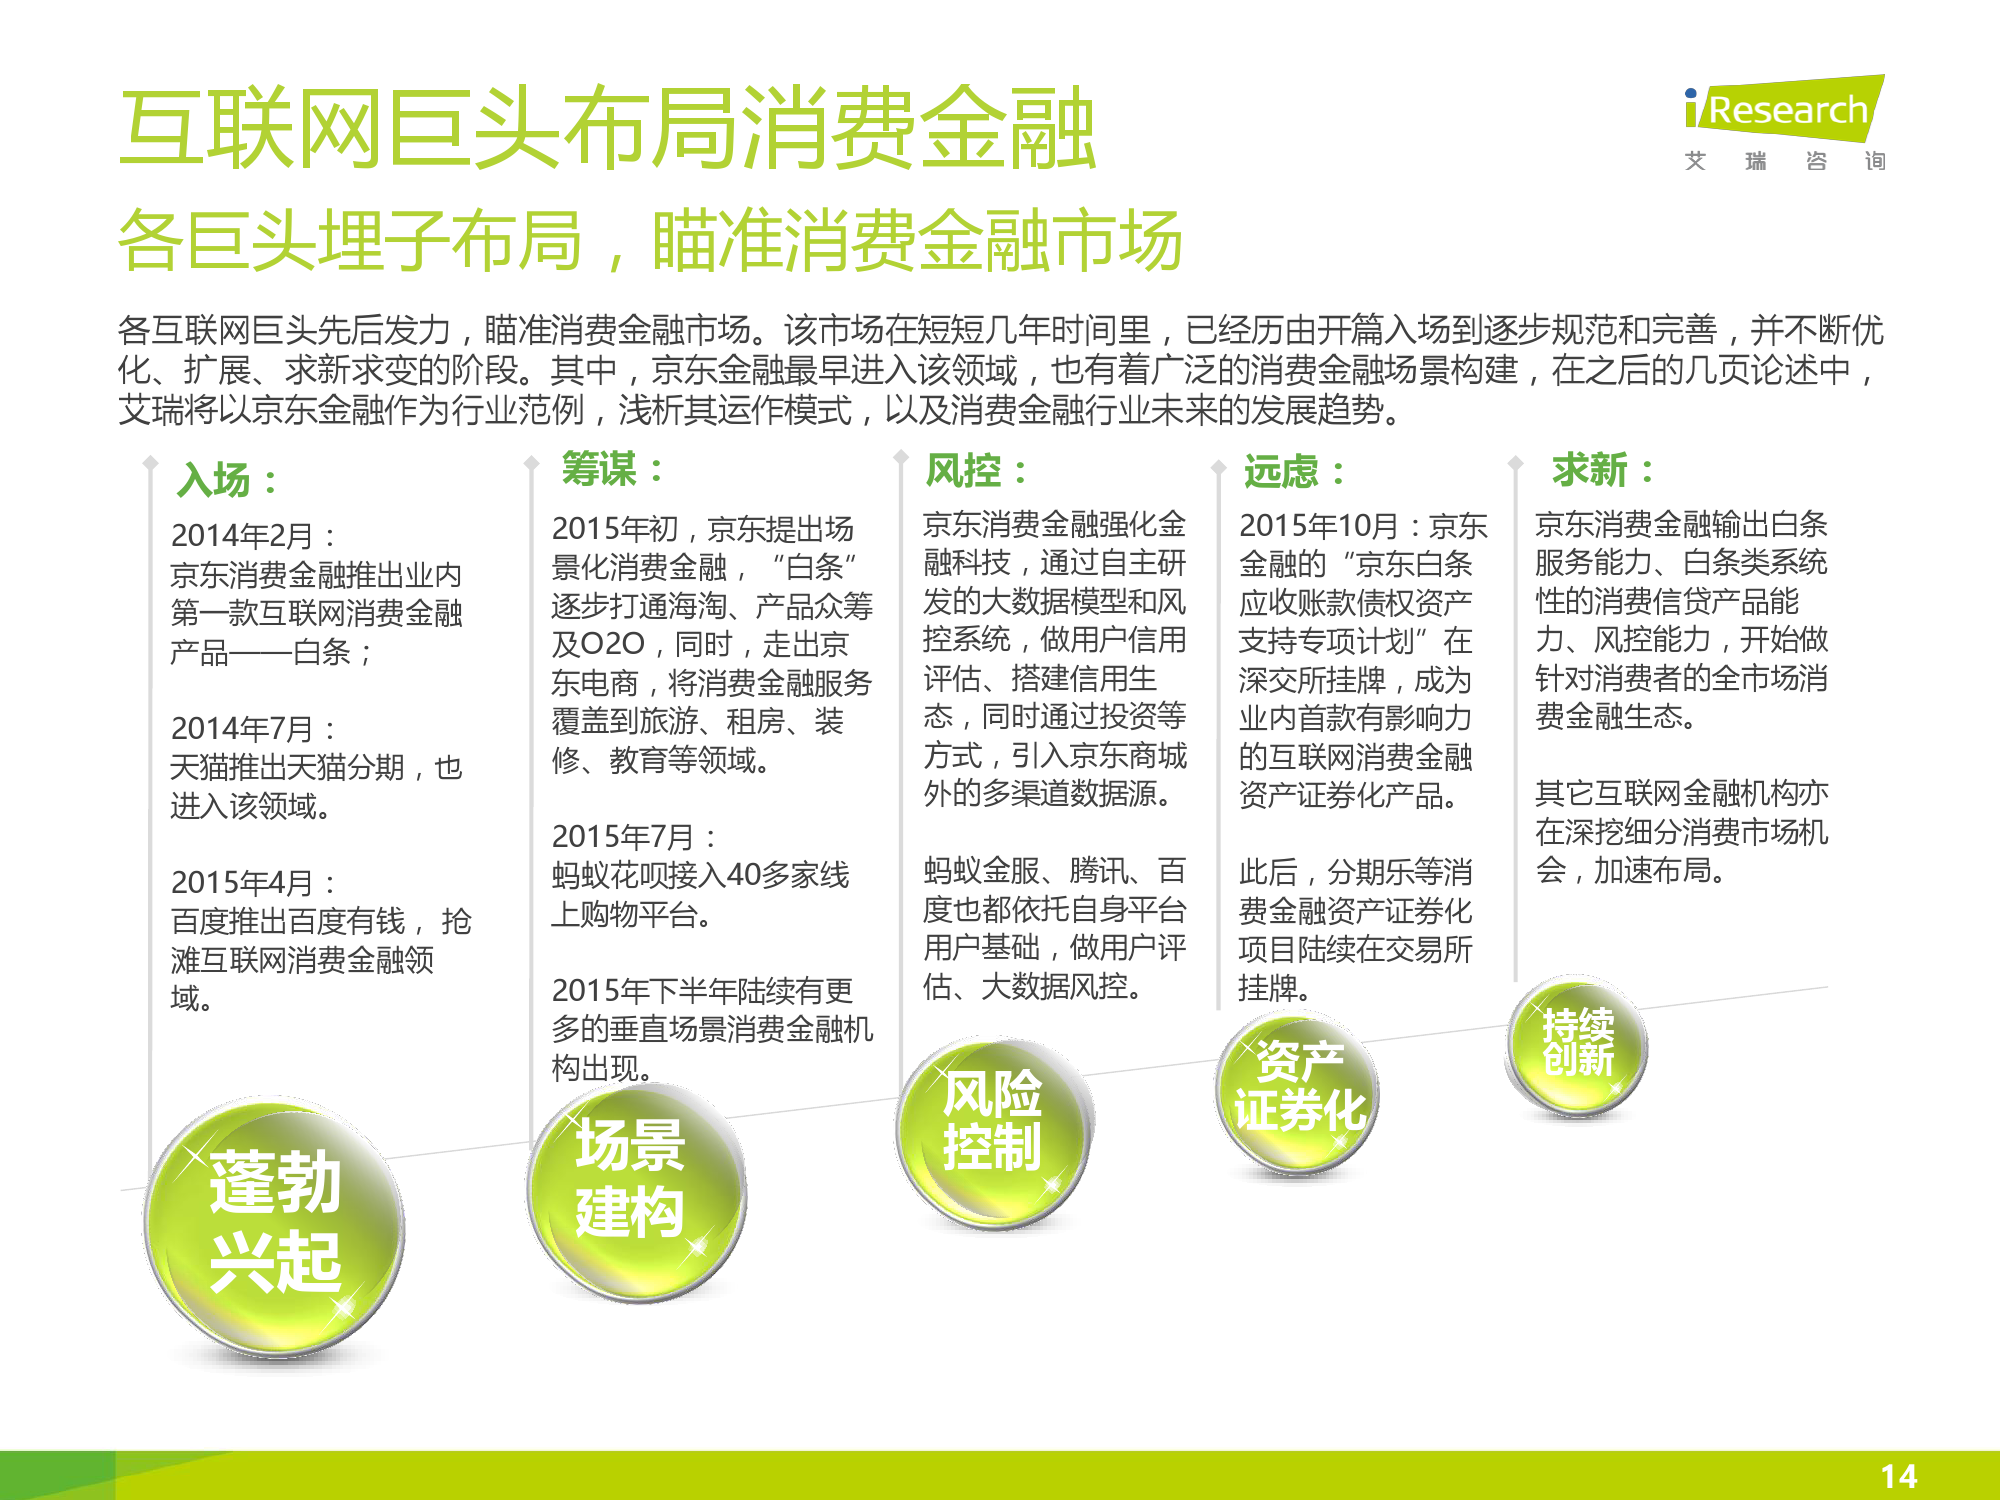 iResearch-2016年中国互联网消费金融市场研究报告_000014